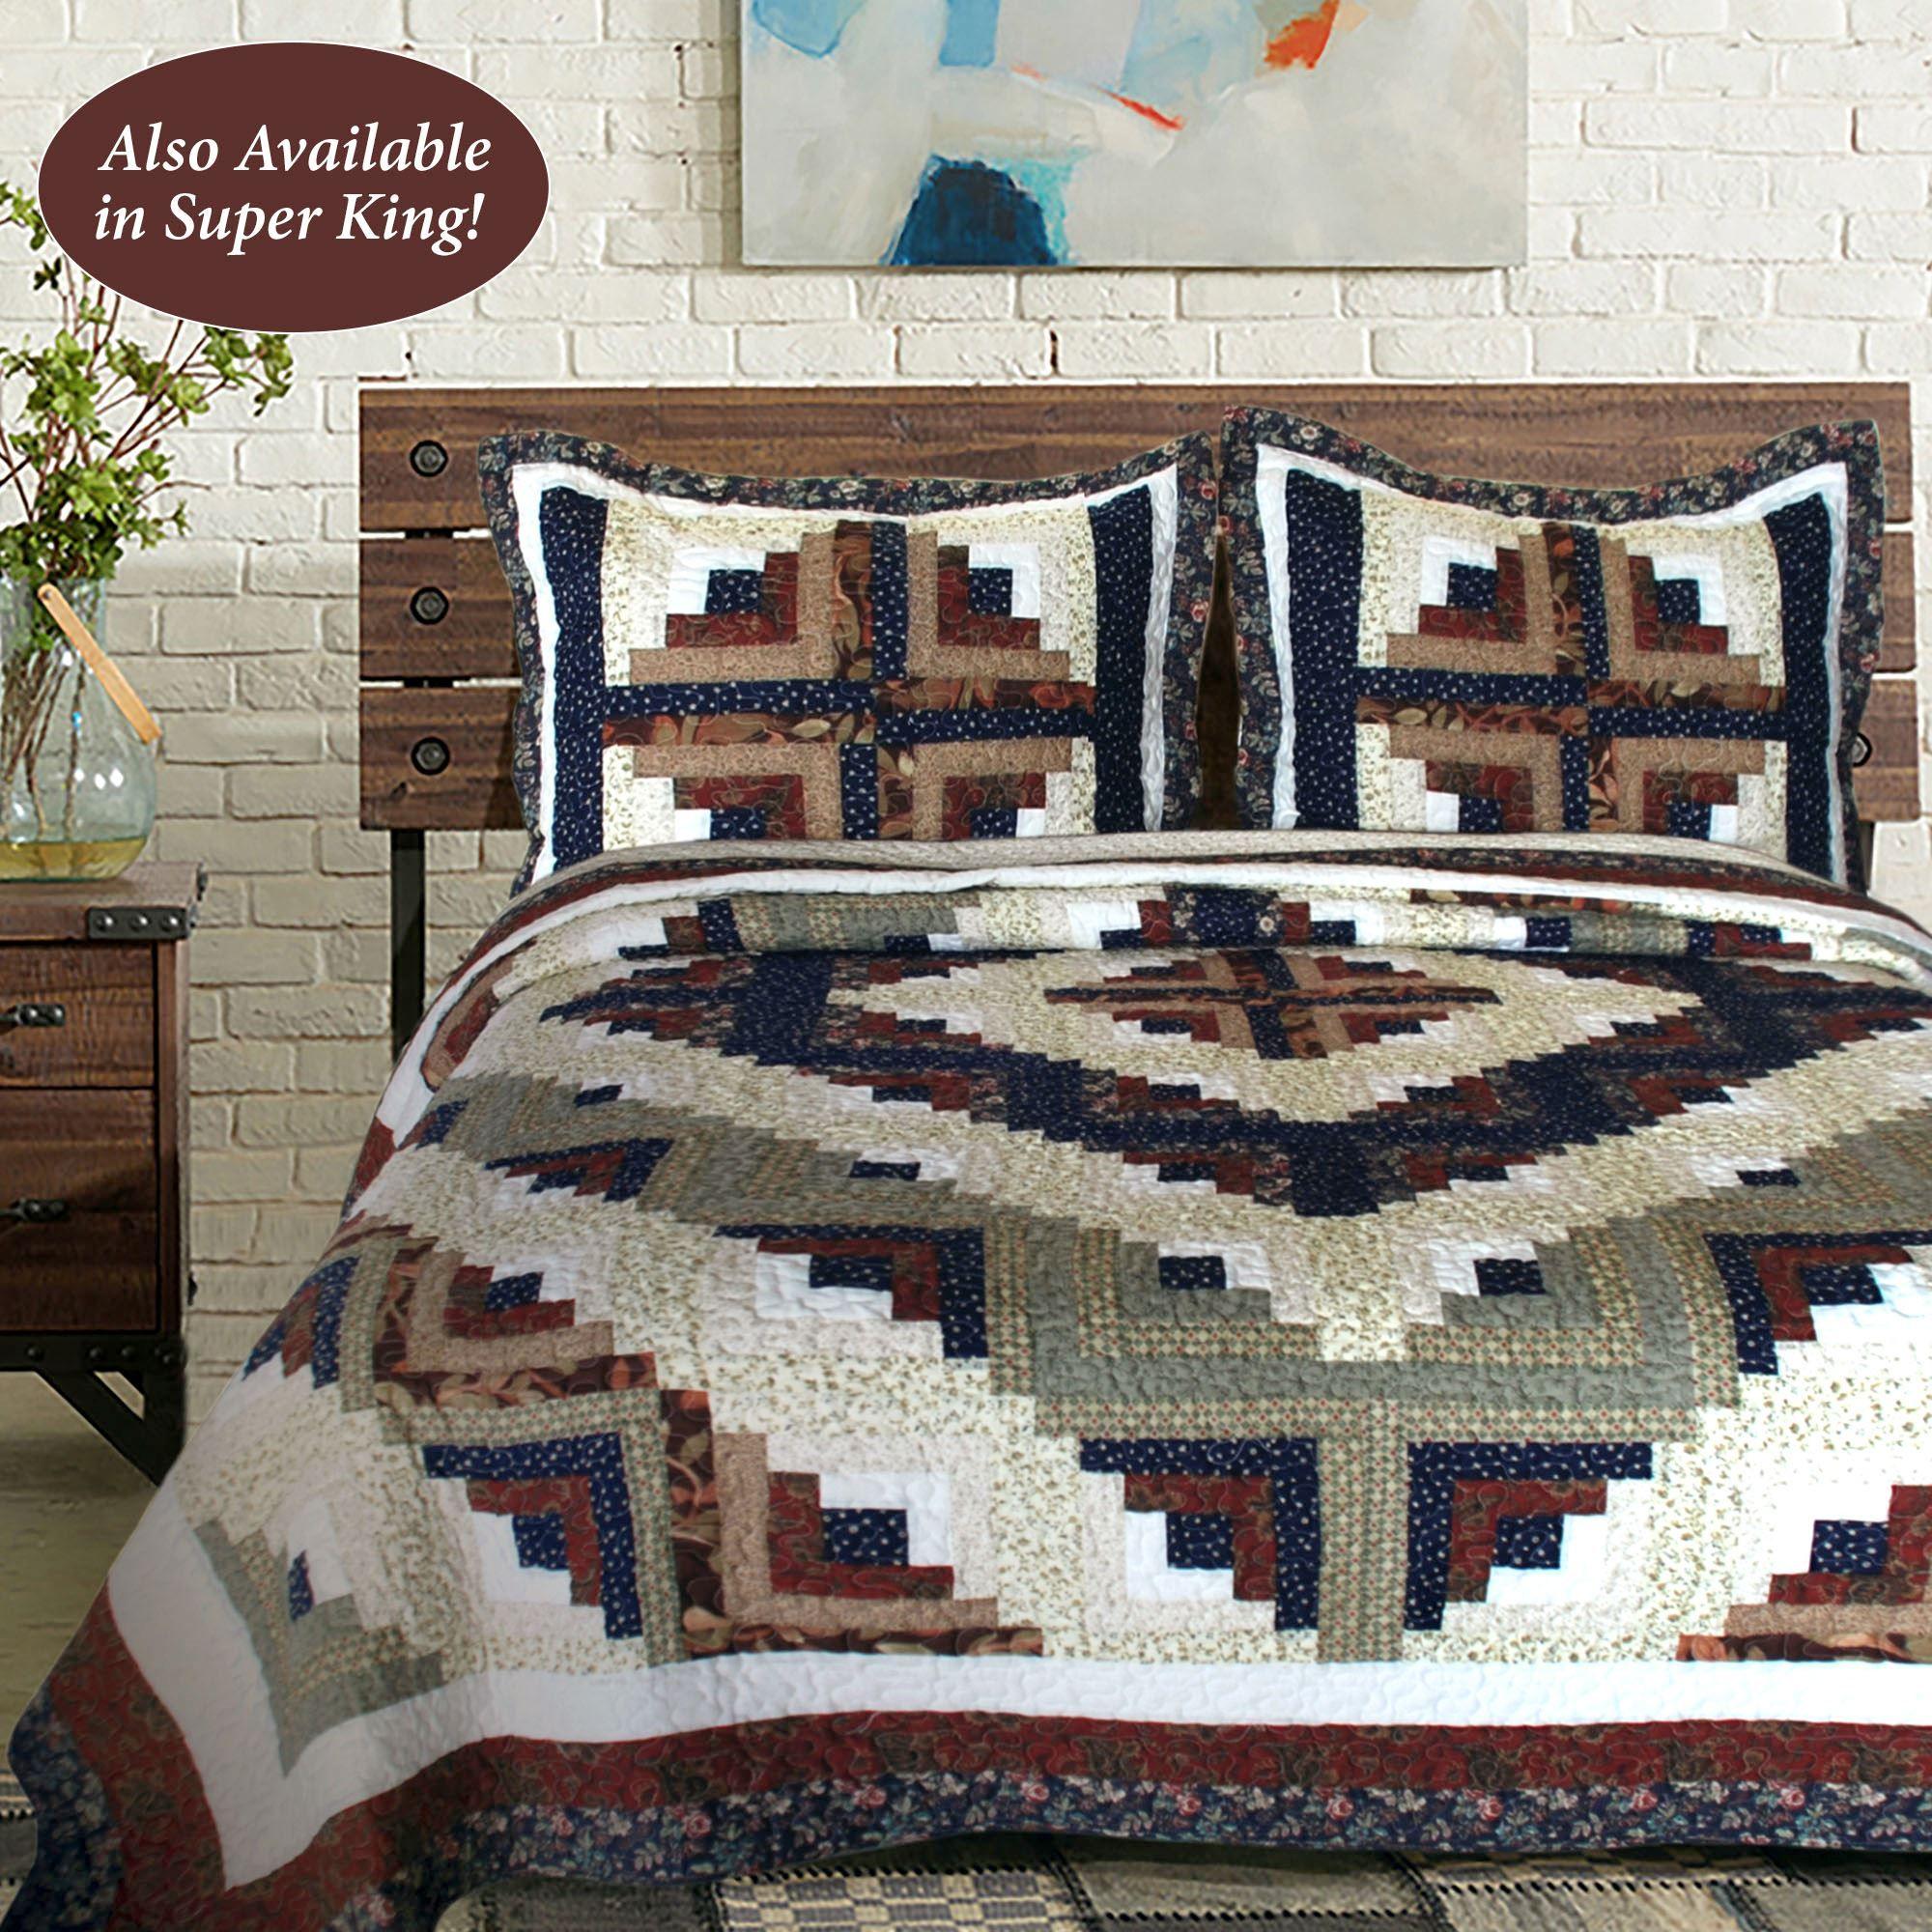 Colorado Cabin Patchwork Quilt Bedding : the patchwork quilt summary - Adamdwight.com